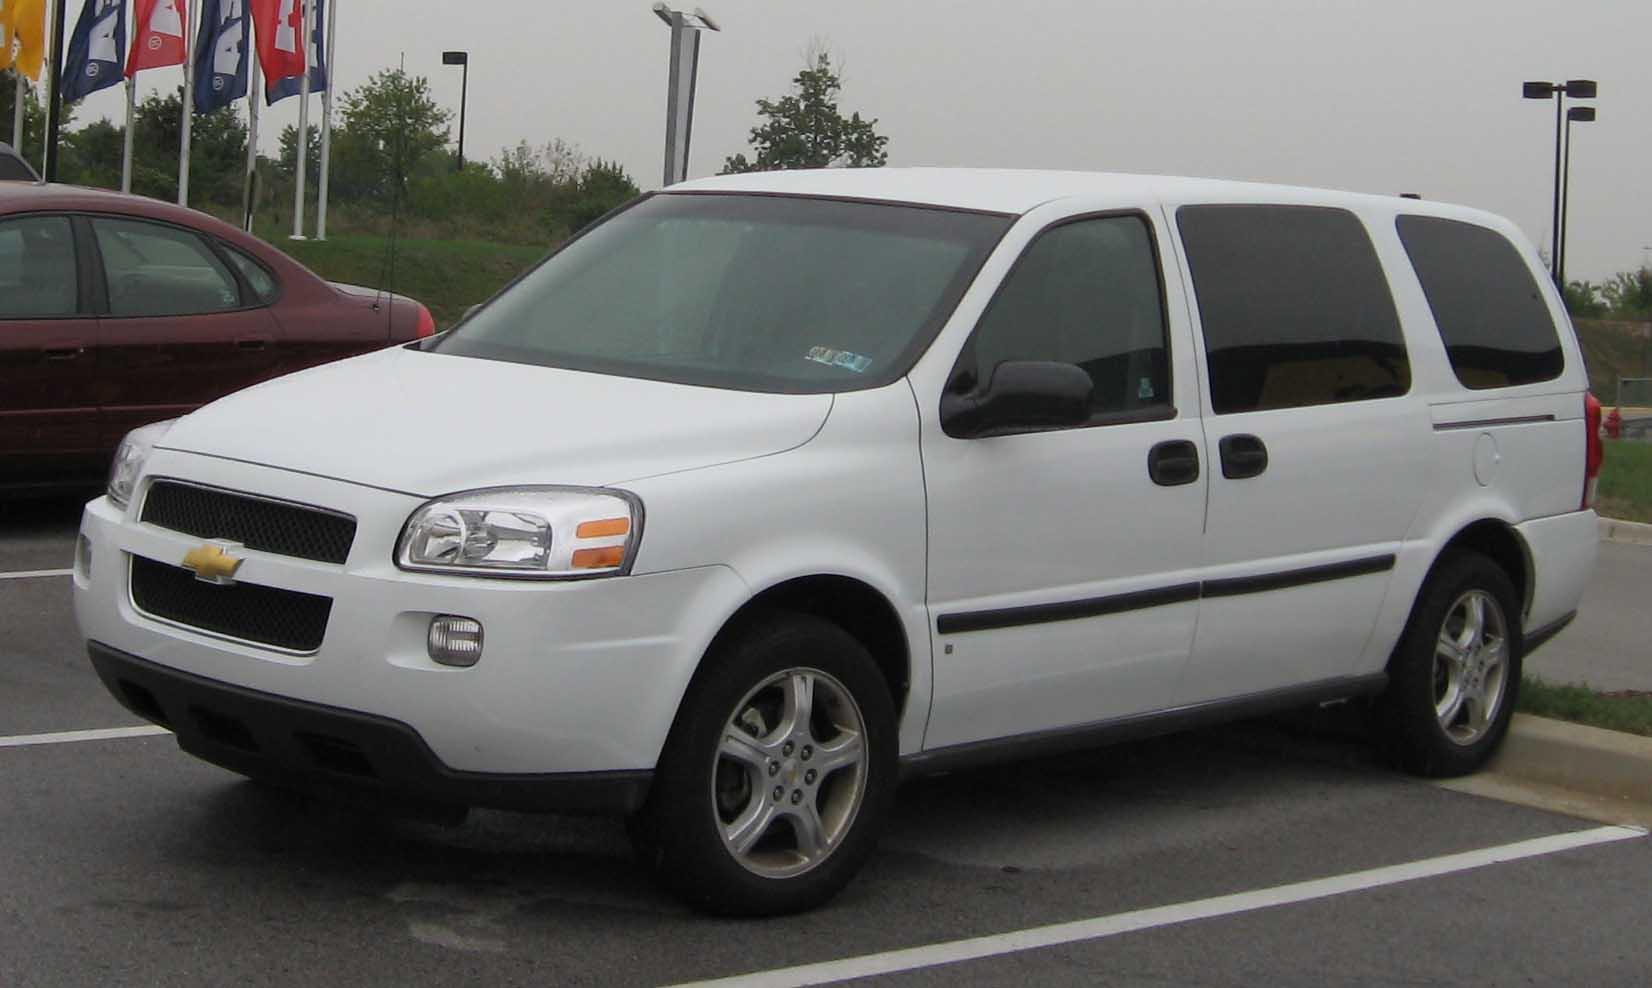 File:Chevrolet-Uplander-LS-LWB.jpg - Wikimedia Commons